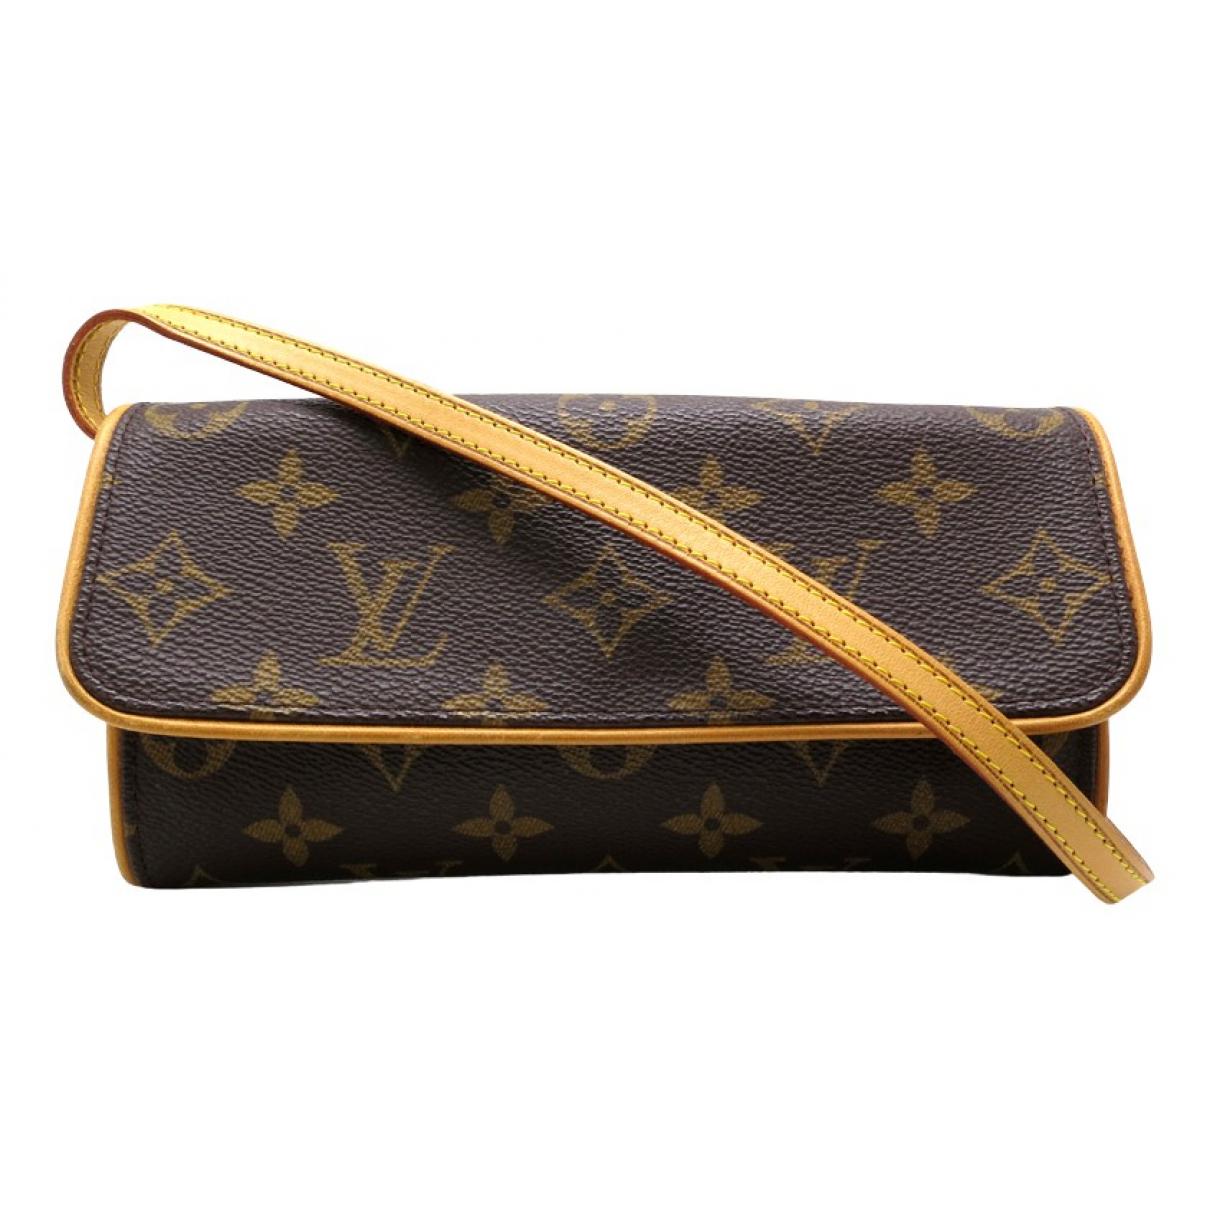 Louis Vuitton Twin Brown Cloth Clutch bag for Women N